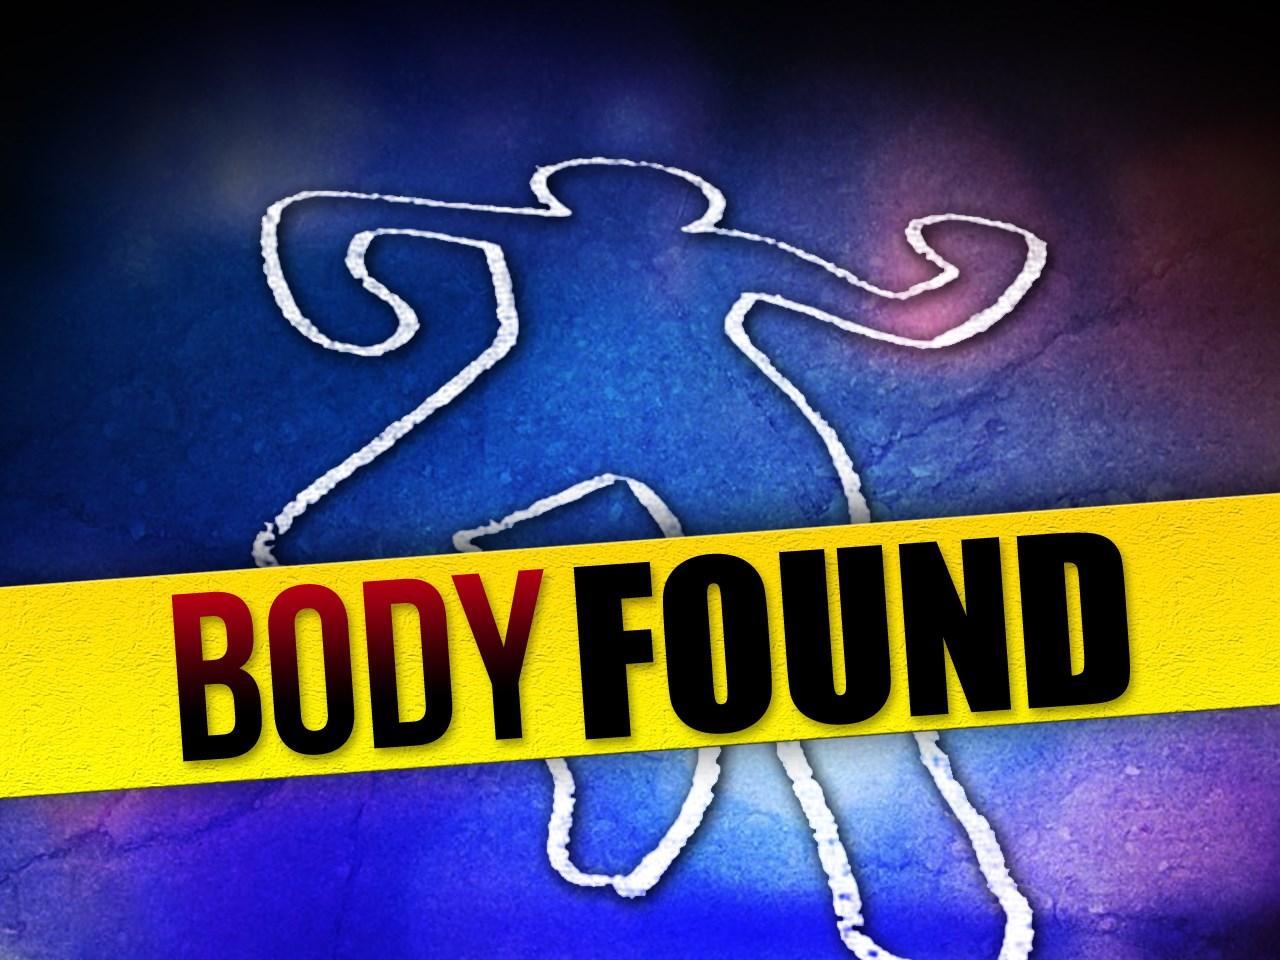 body found in yankton